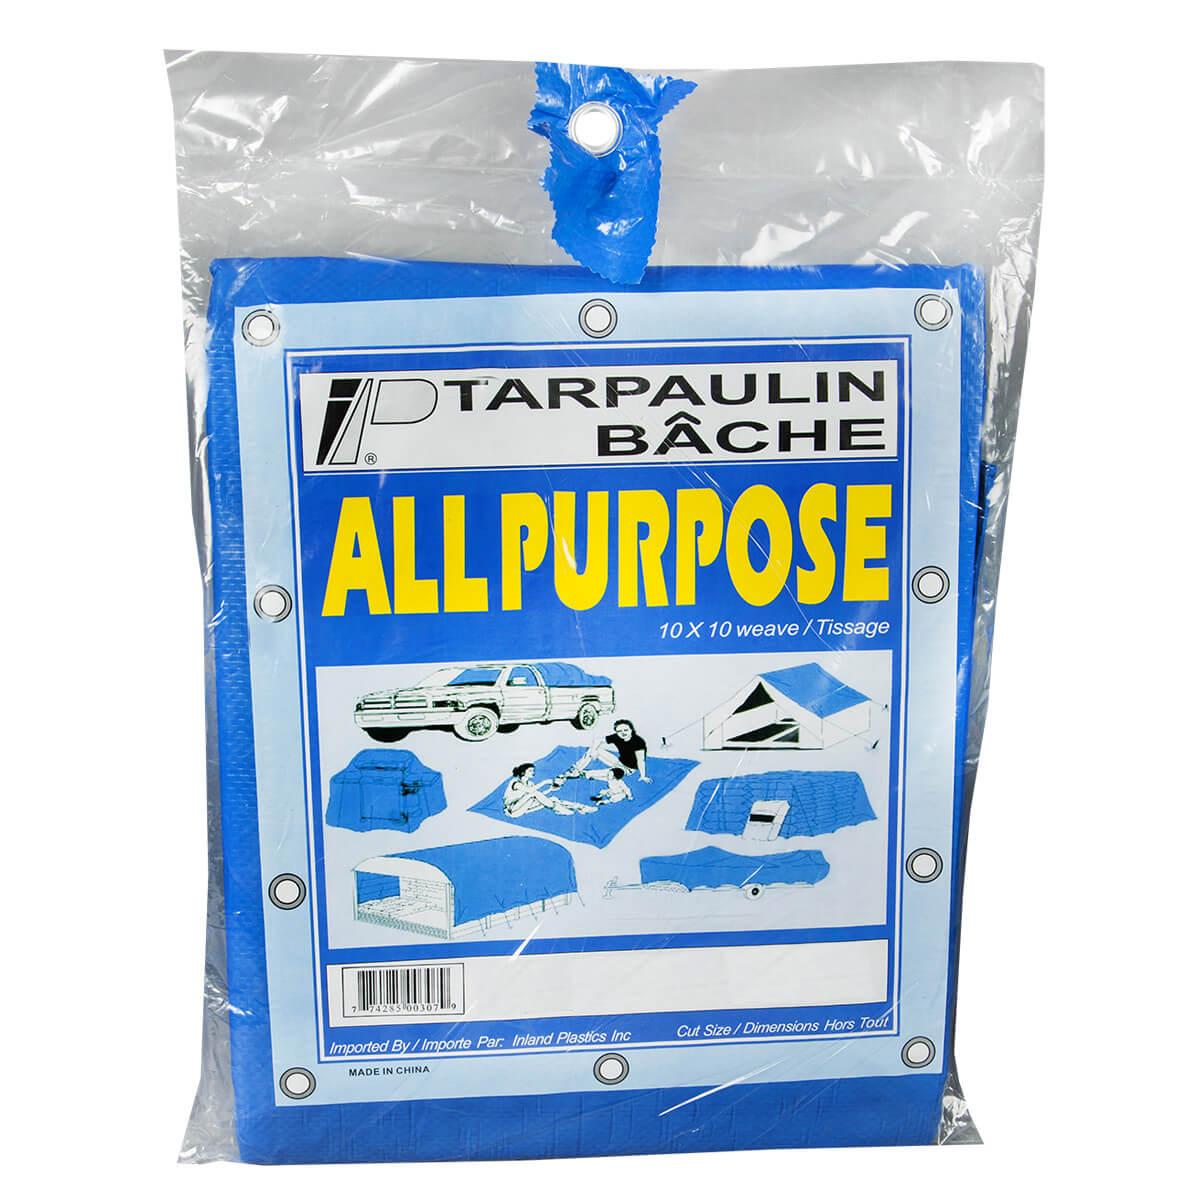 All Purpose Blue Utility Tarps - 10' x 14'